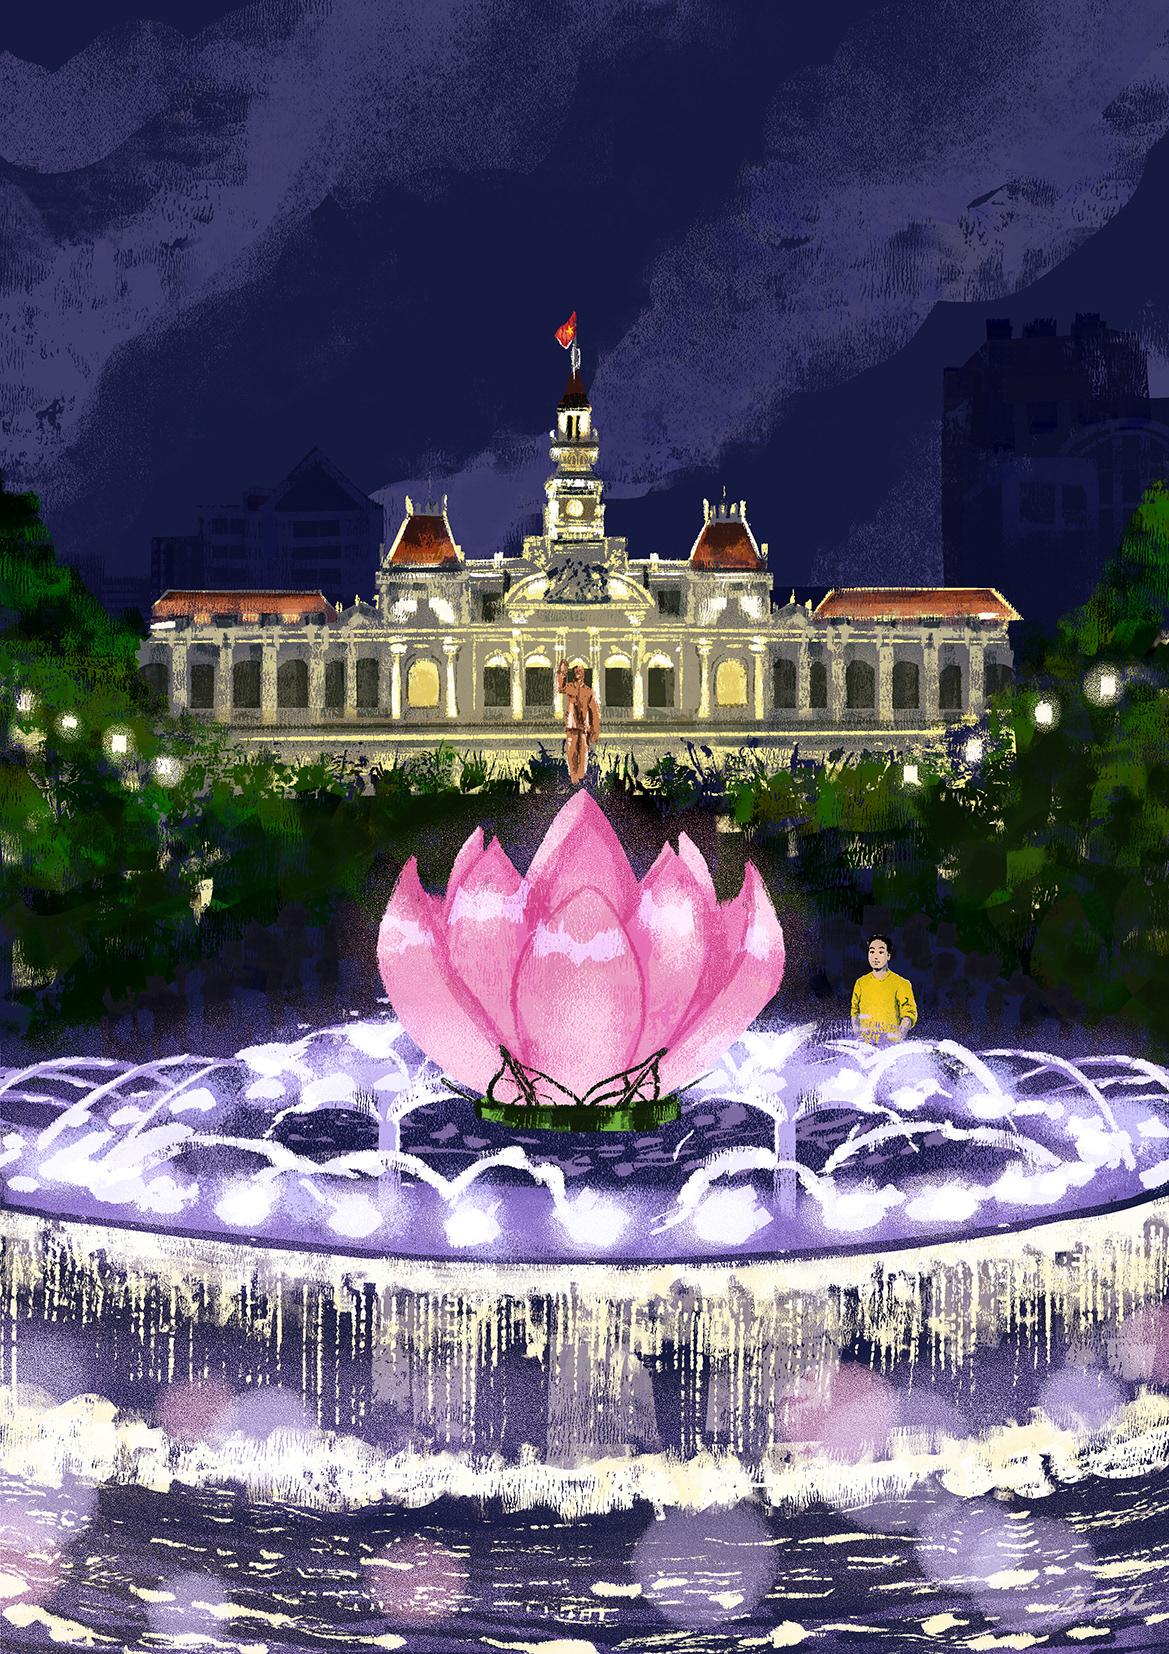 100 Góc Phố SàiGòn 100 Views of Saigon ho chi minh city ILLUSTRATION  saigon vietnam